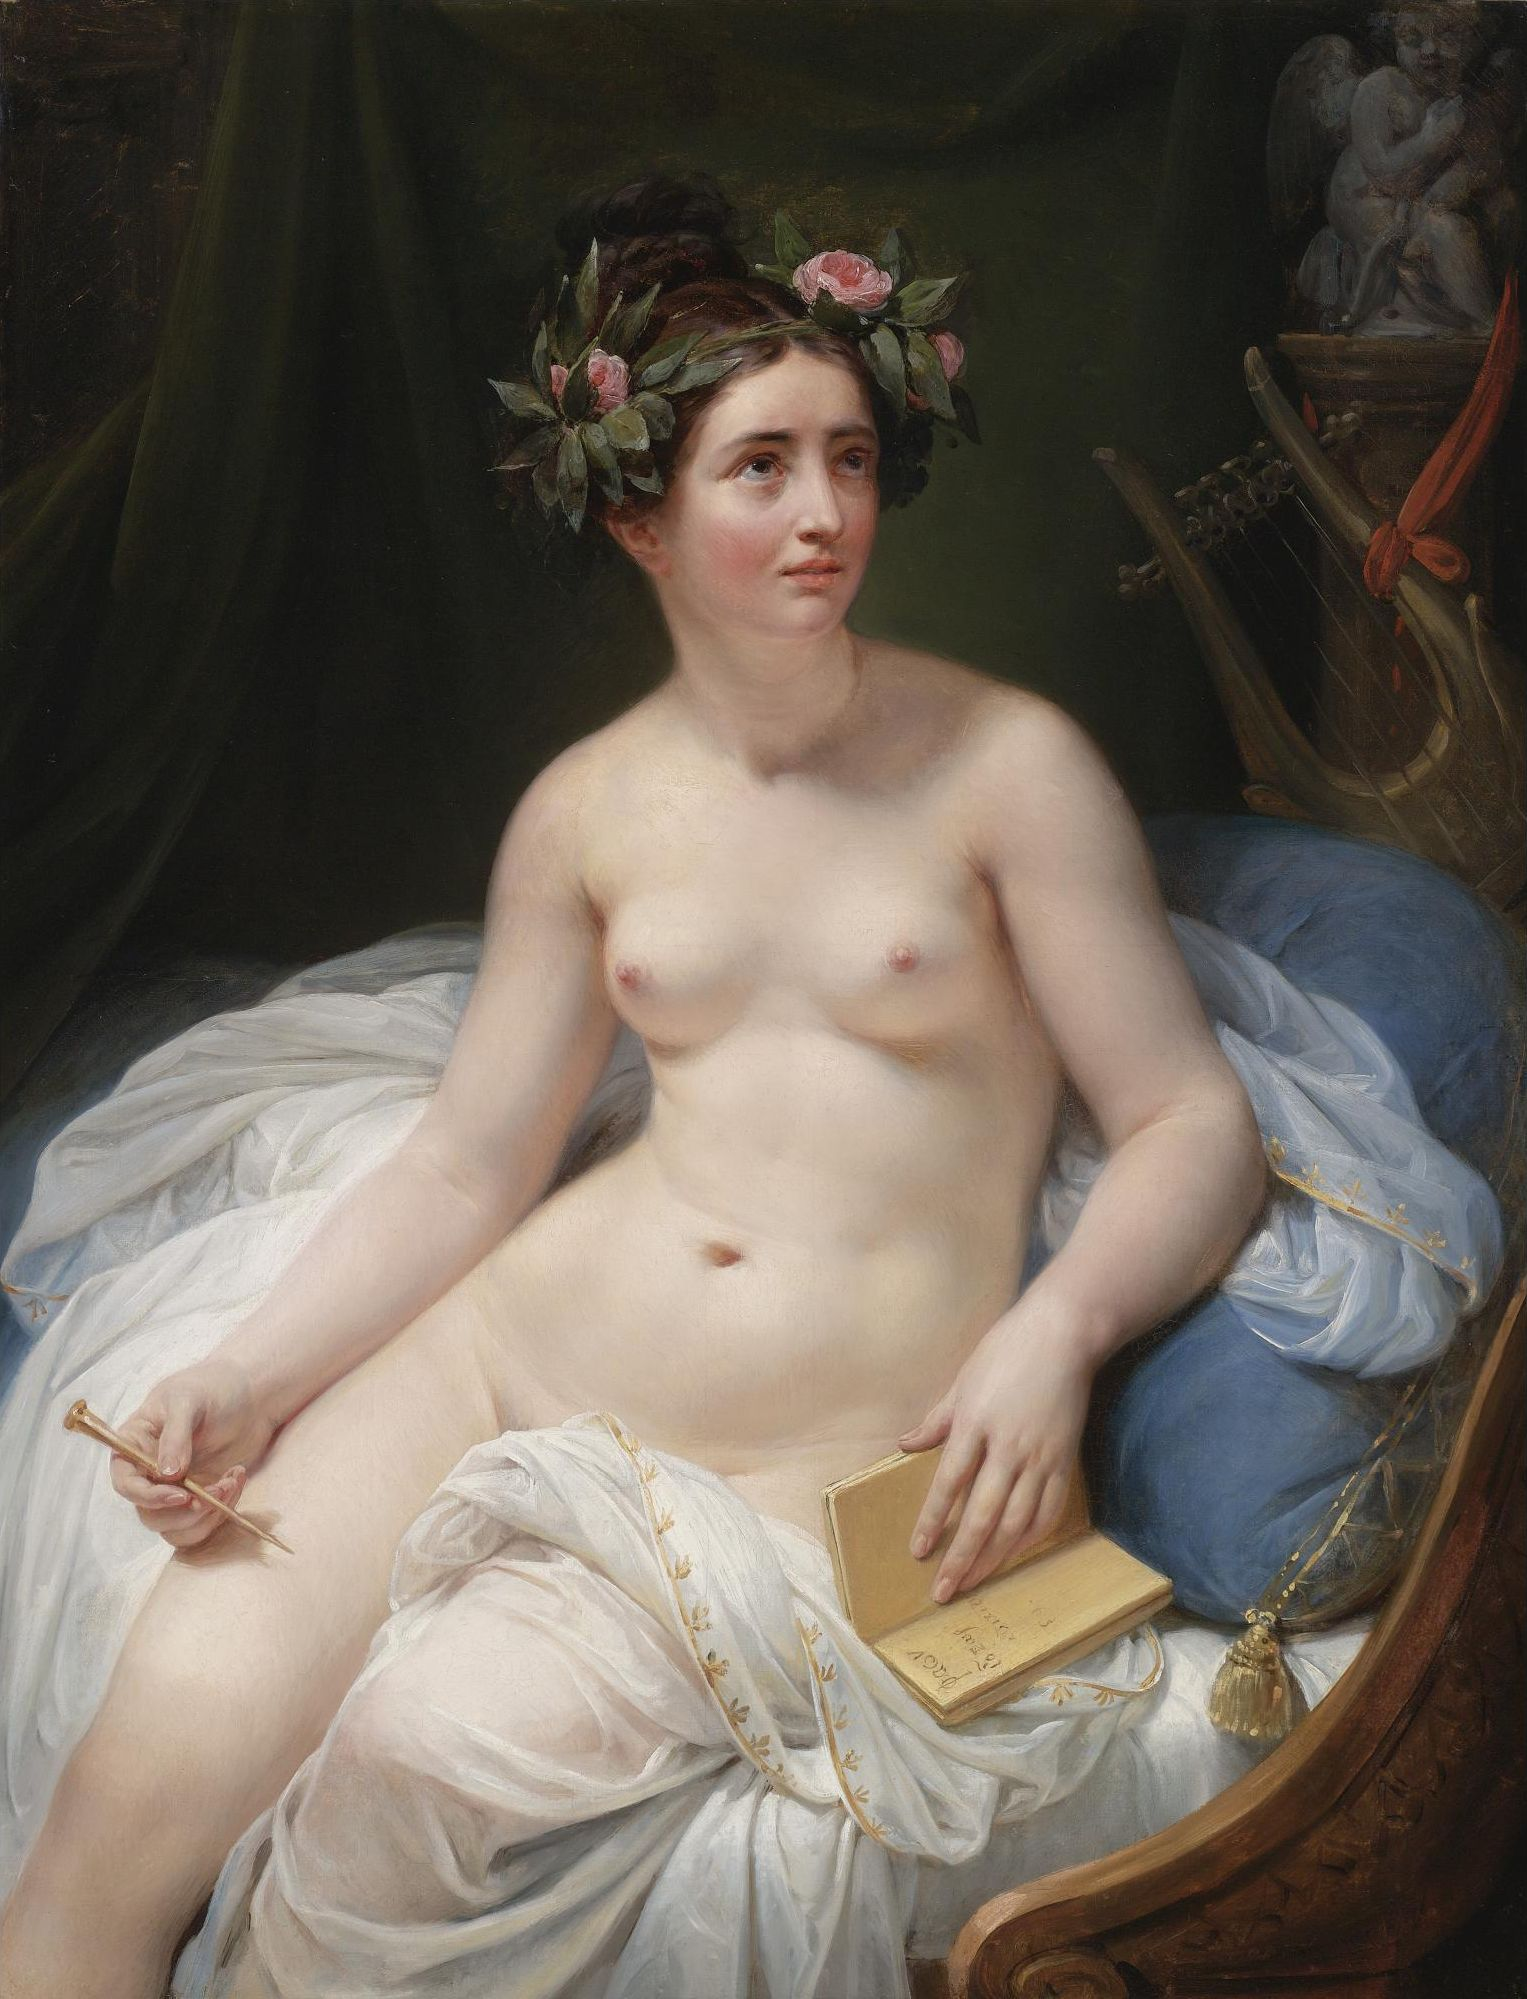 Jacques-Louis David, 1748-1825 (круг). Поэтесса Сапфо. 1819. 117.5 х 90.8 см. Частная коллекция